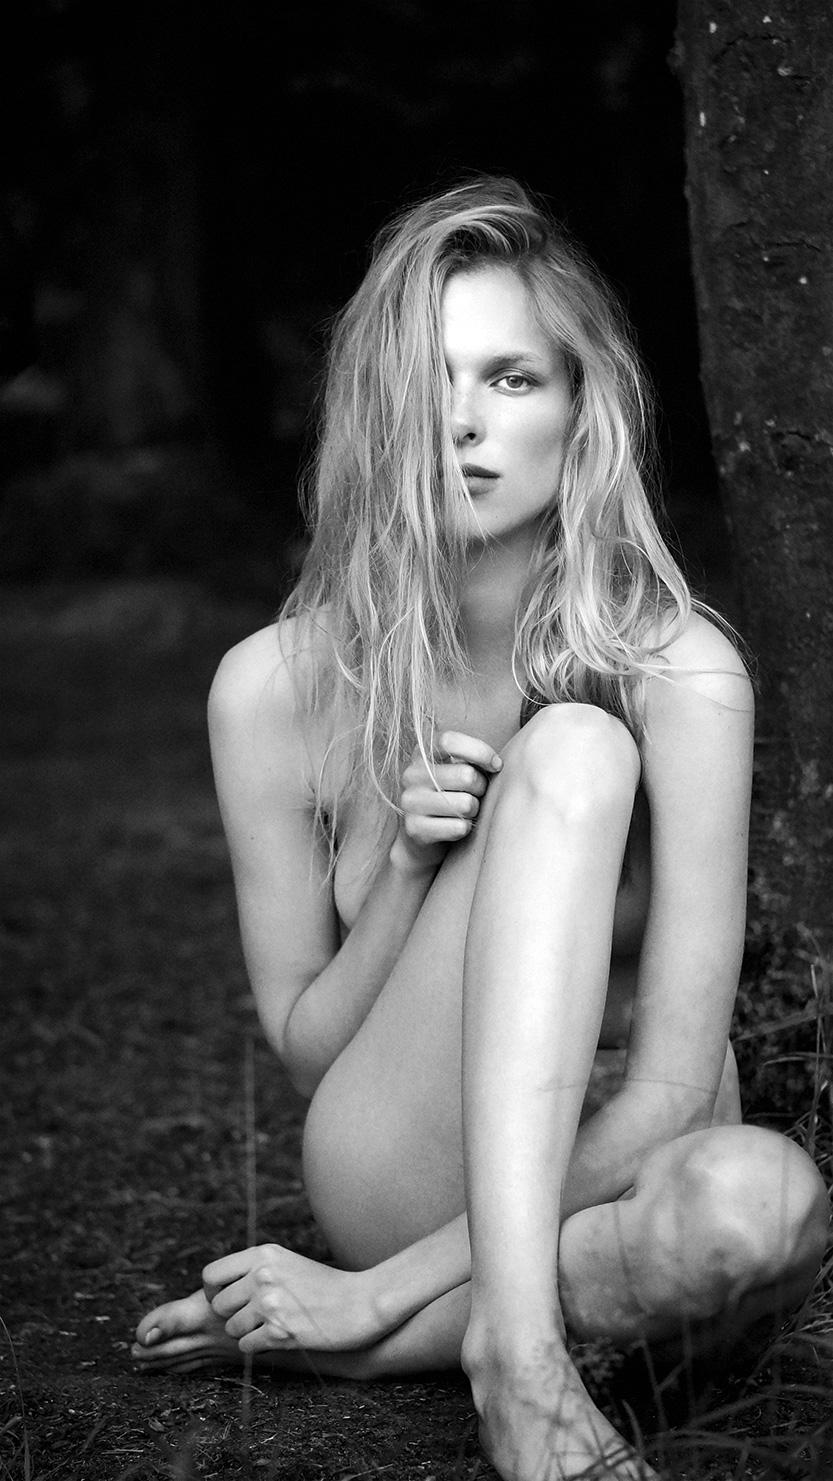 Iris Bahr Nude Stunning m4 models sonja gutschera & leif henrik osthoff